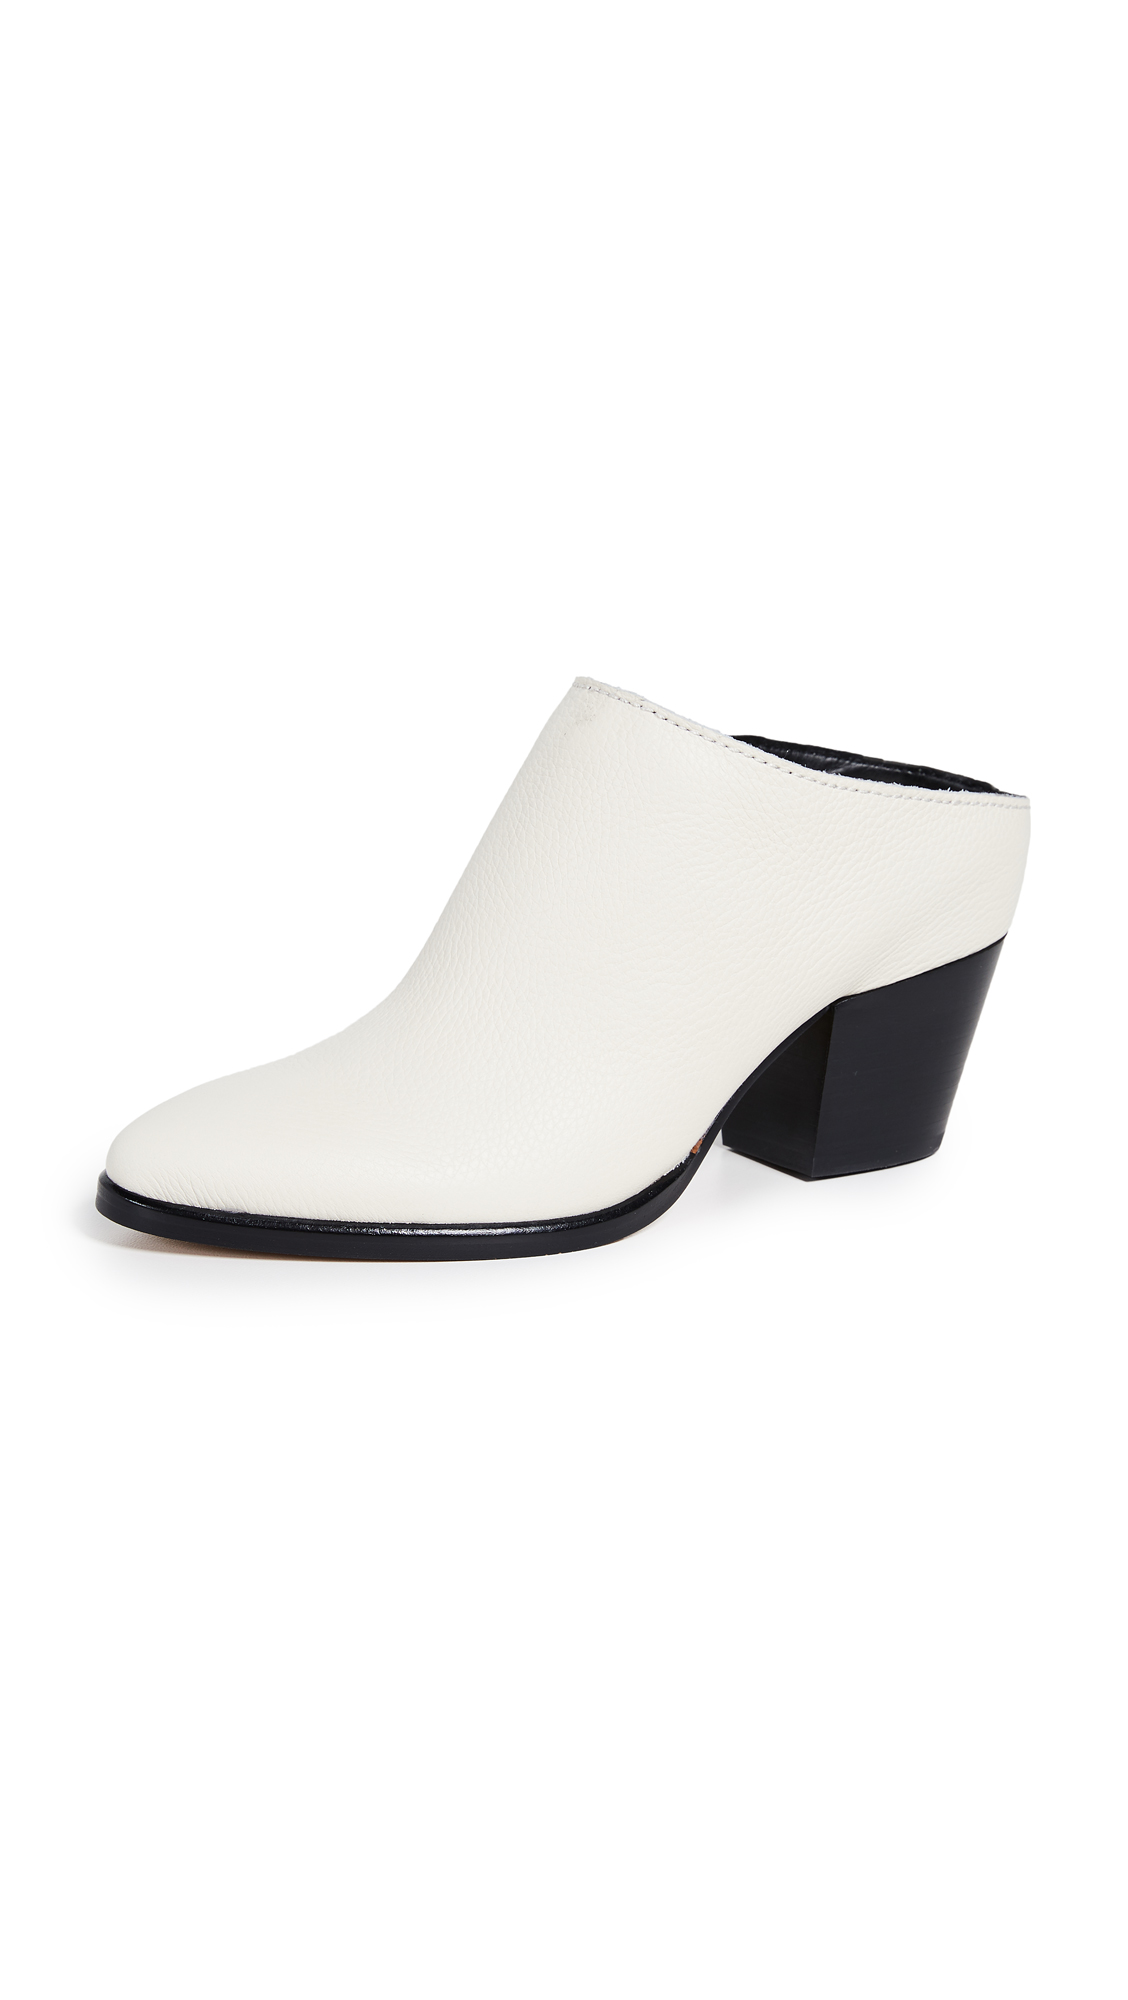 Dolce Vita Roya Block Heel Mules - Off White